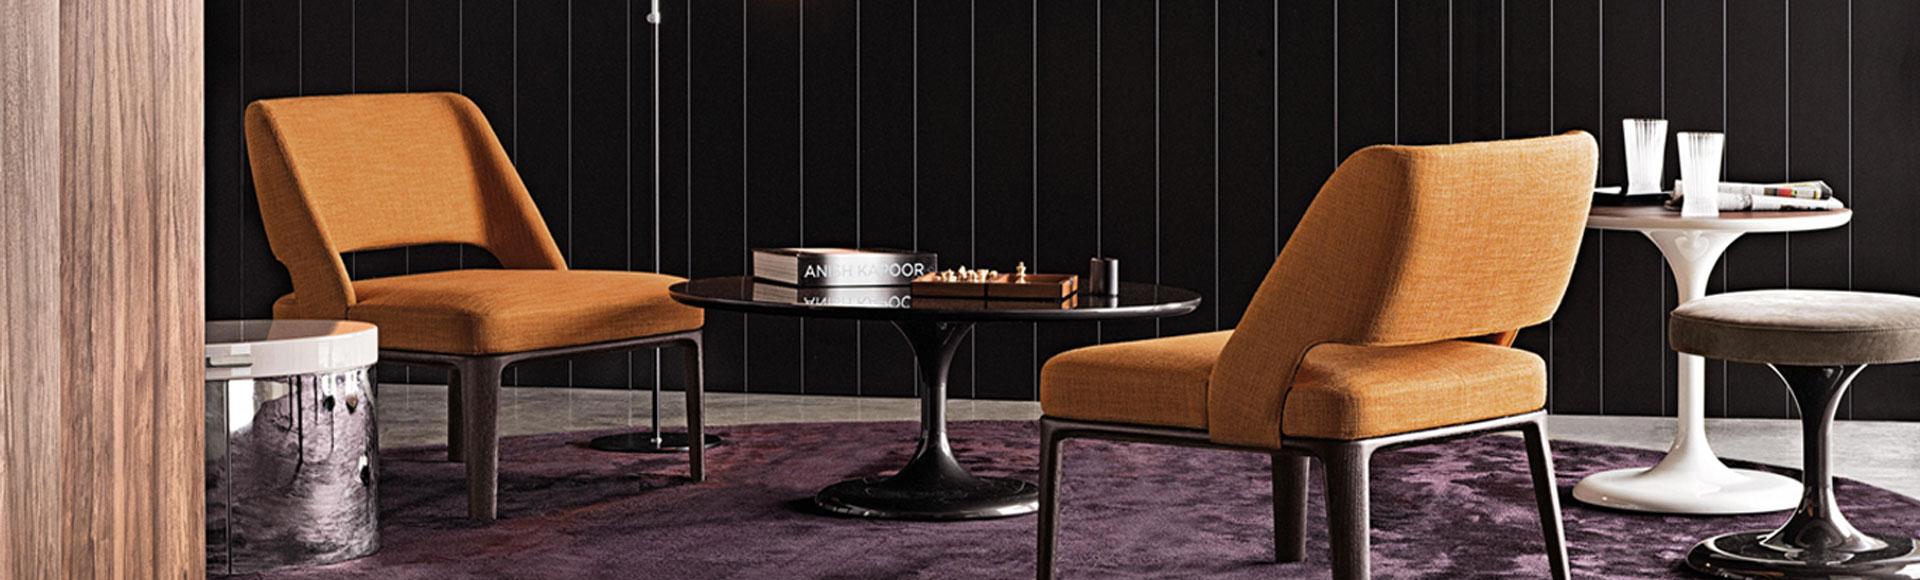 Premium Leather Armchairs at IDUS Furniture Store